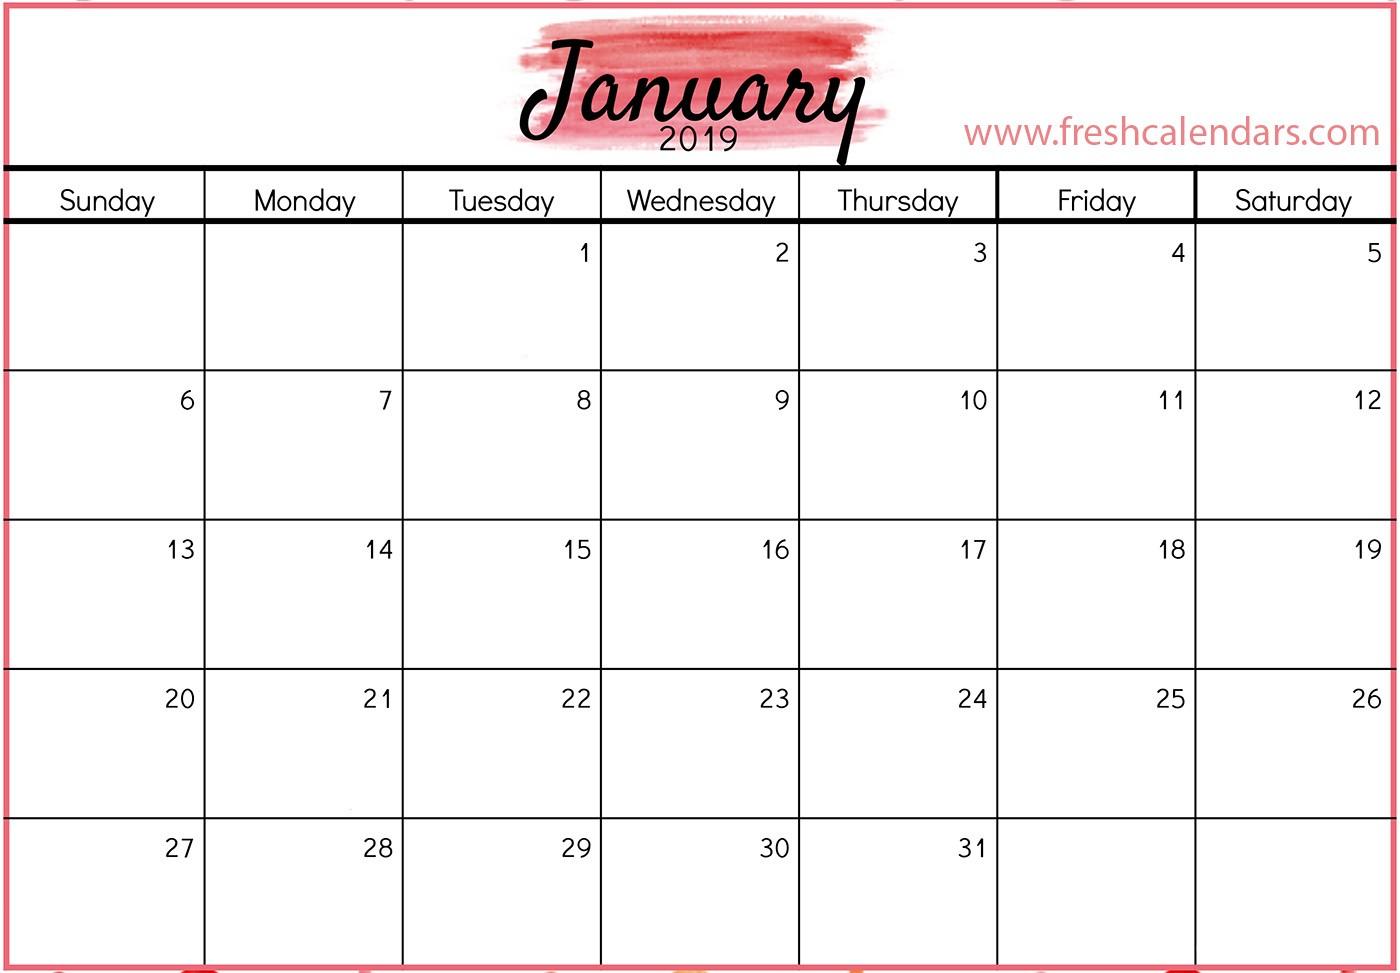 Template for Calendar 2019 January 2019 Calendar Printable Fresh Calendars